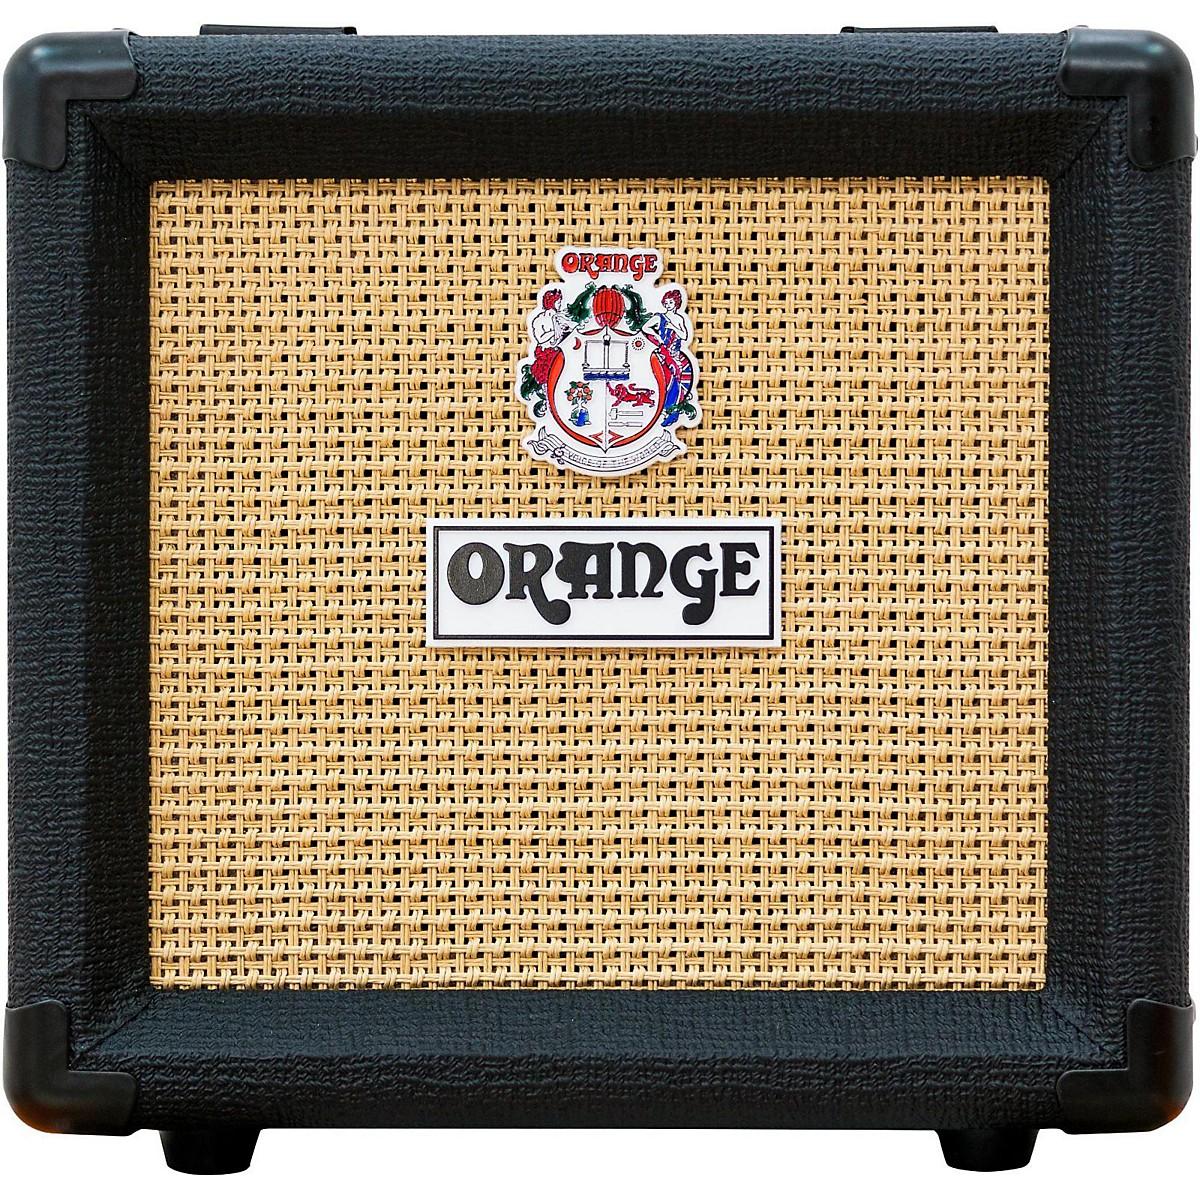 Orange Amplifiers PPC108 Micro Dark 20W 1x8 Guitar Speaker Cabinet